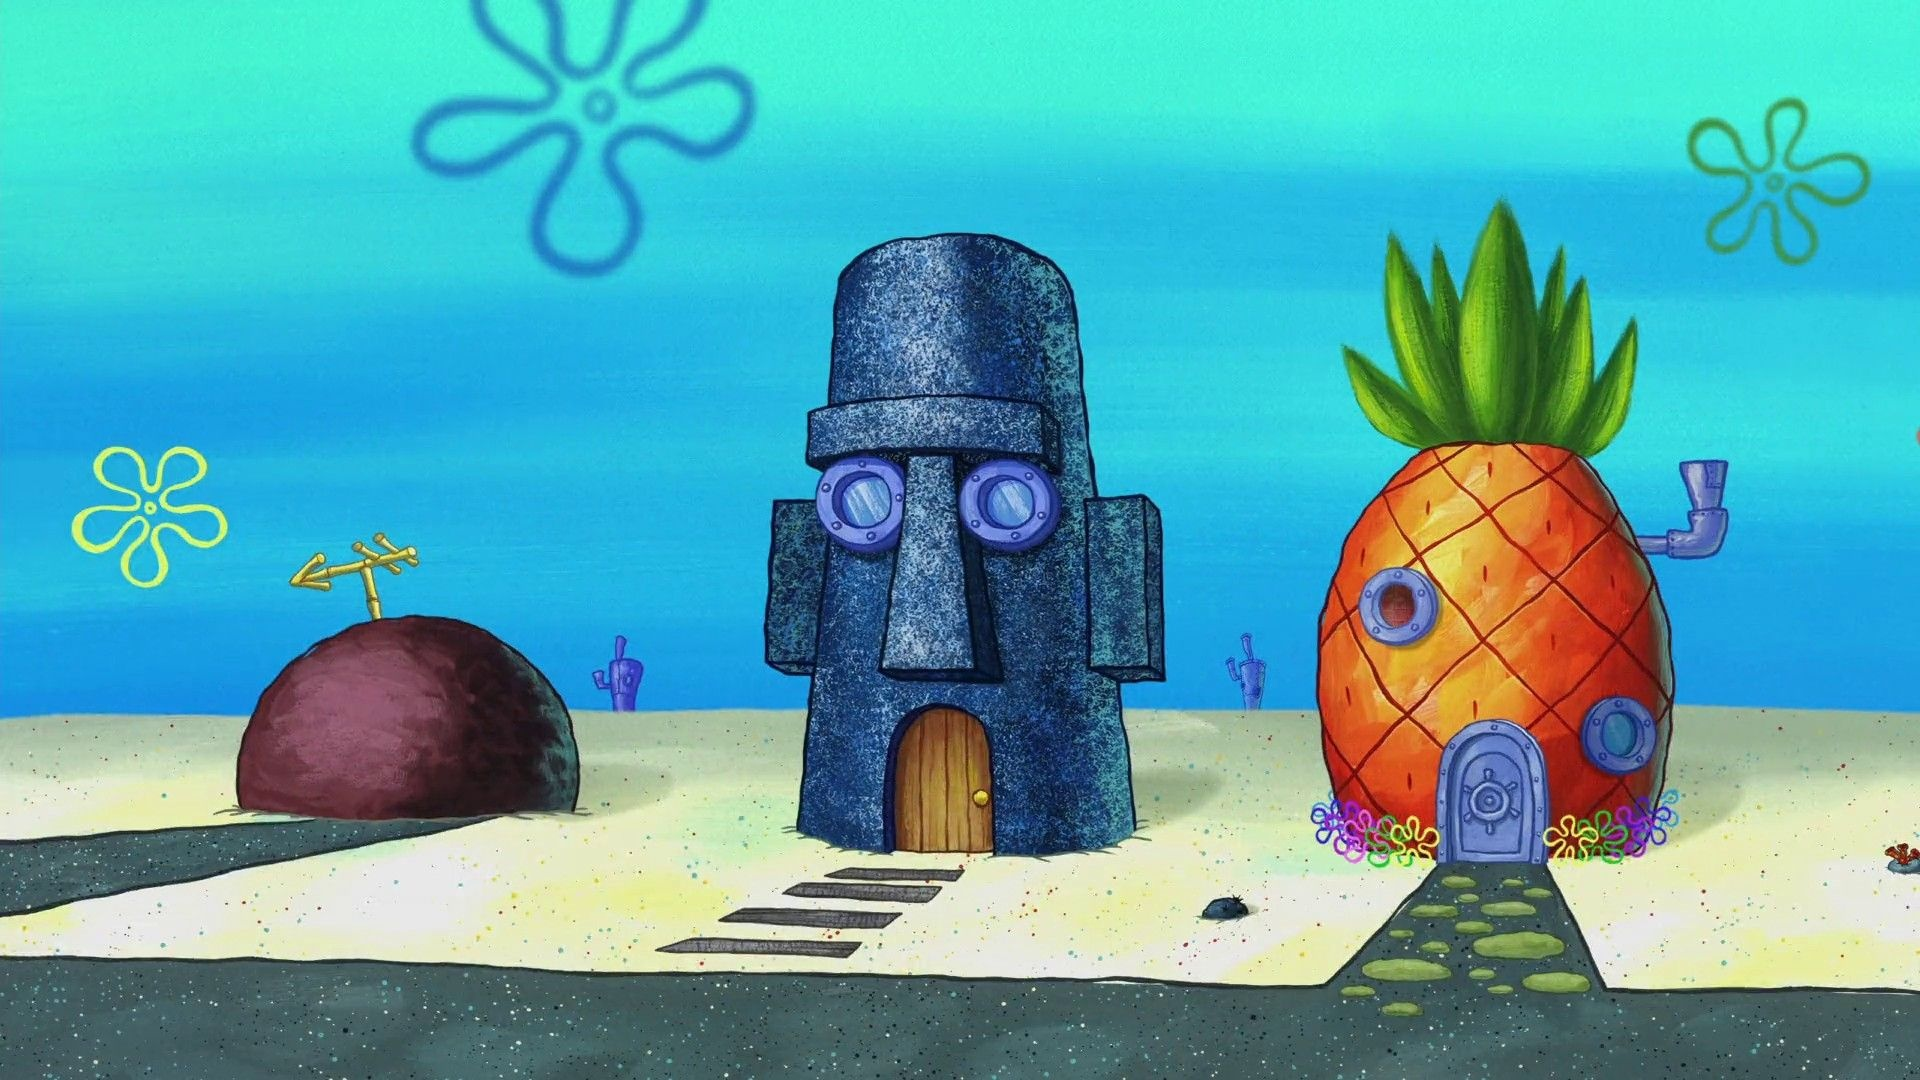 Sponge best picture